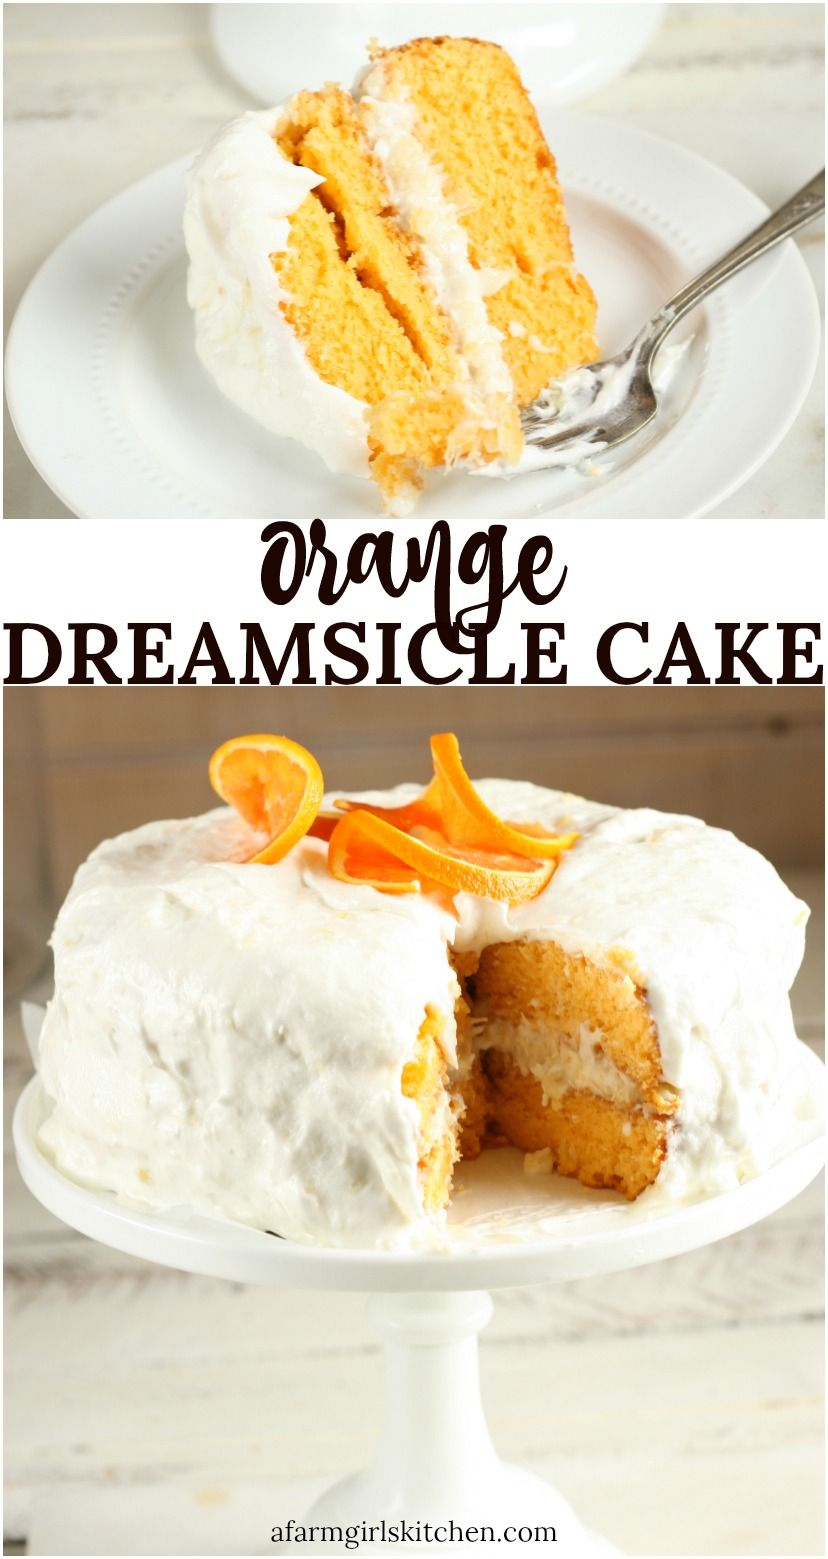 Orange Dreamsicle Cake From Cake Mix In 2020 Orange Dreamsicle Cake Recipe Orange Cake Recipe Dreamsicle Cake Recipe